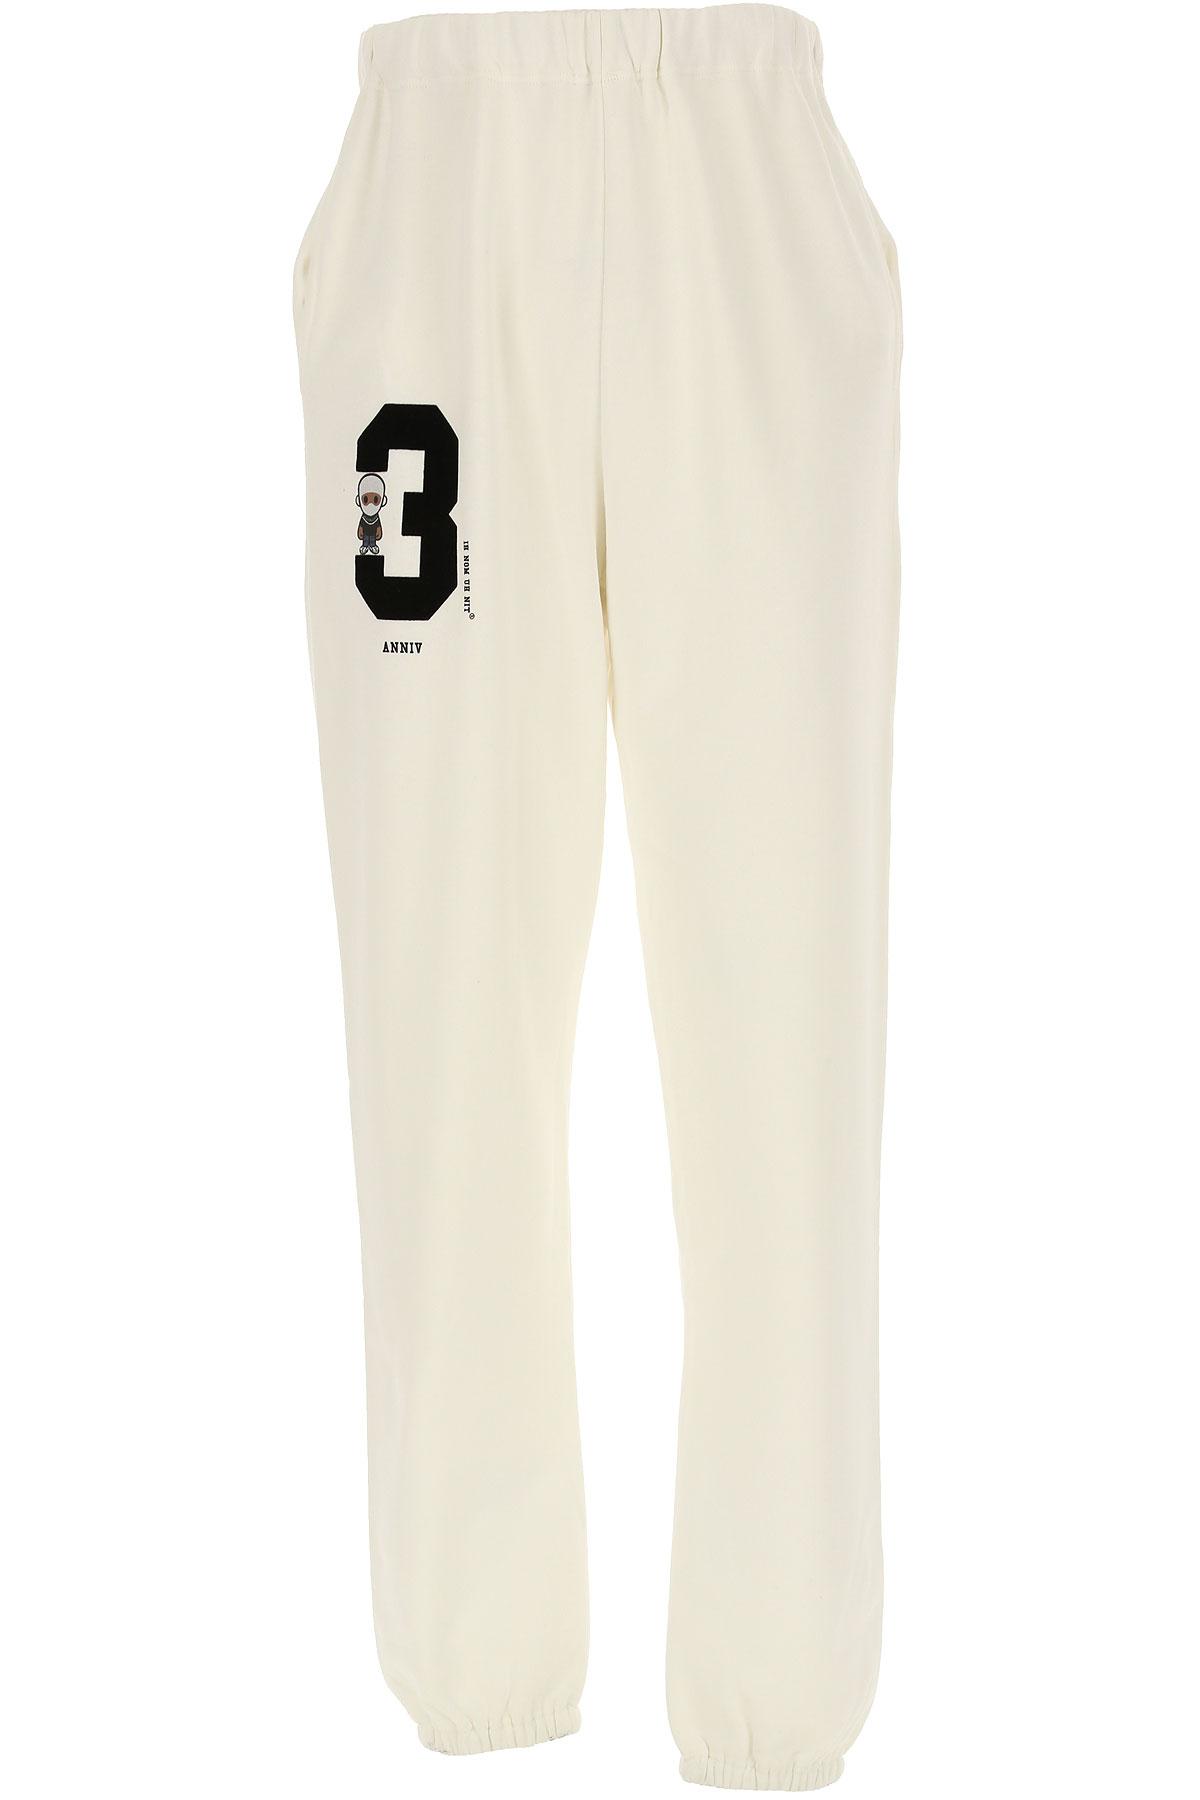 Ih Nom Uh Nit Sweatpants On Sale, White, Cotton, 2019, L (EU 50) M (EU 48)